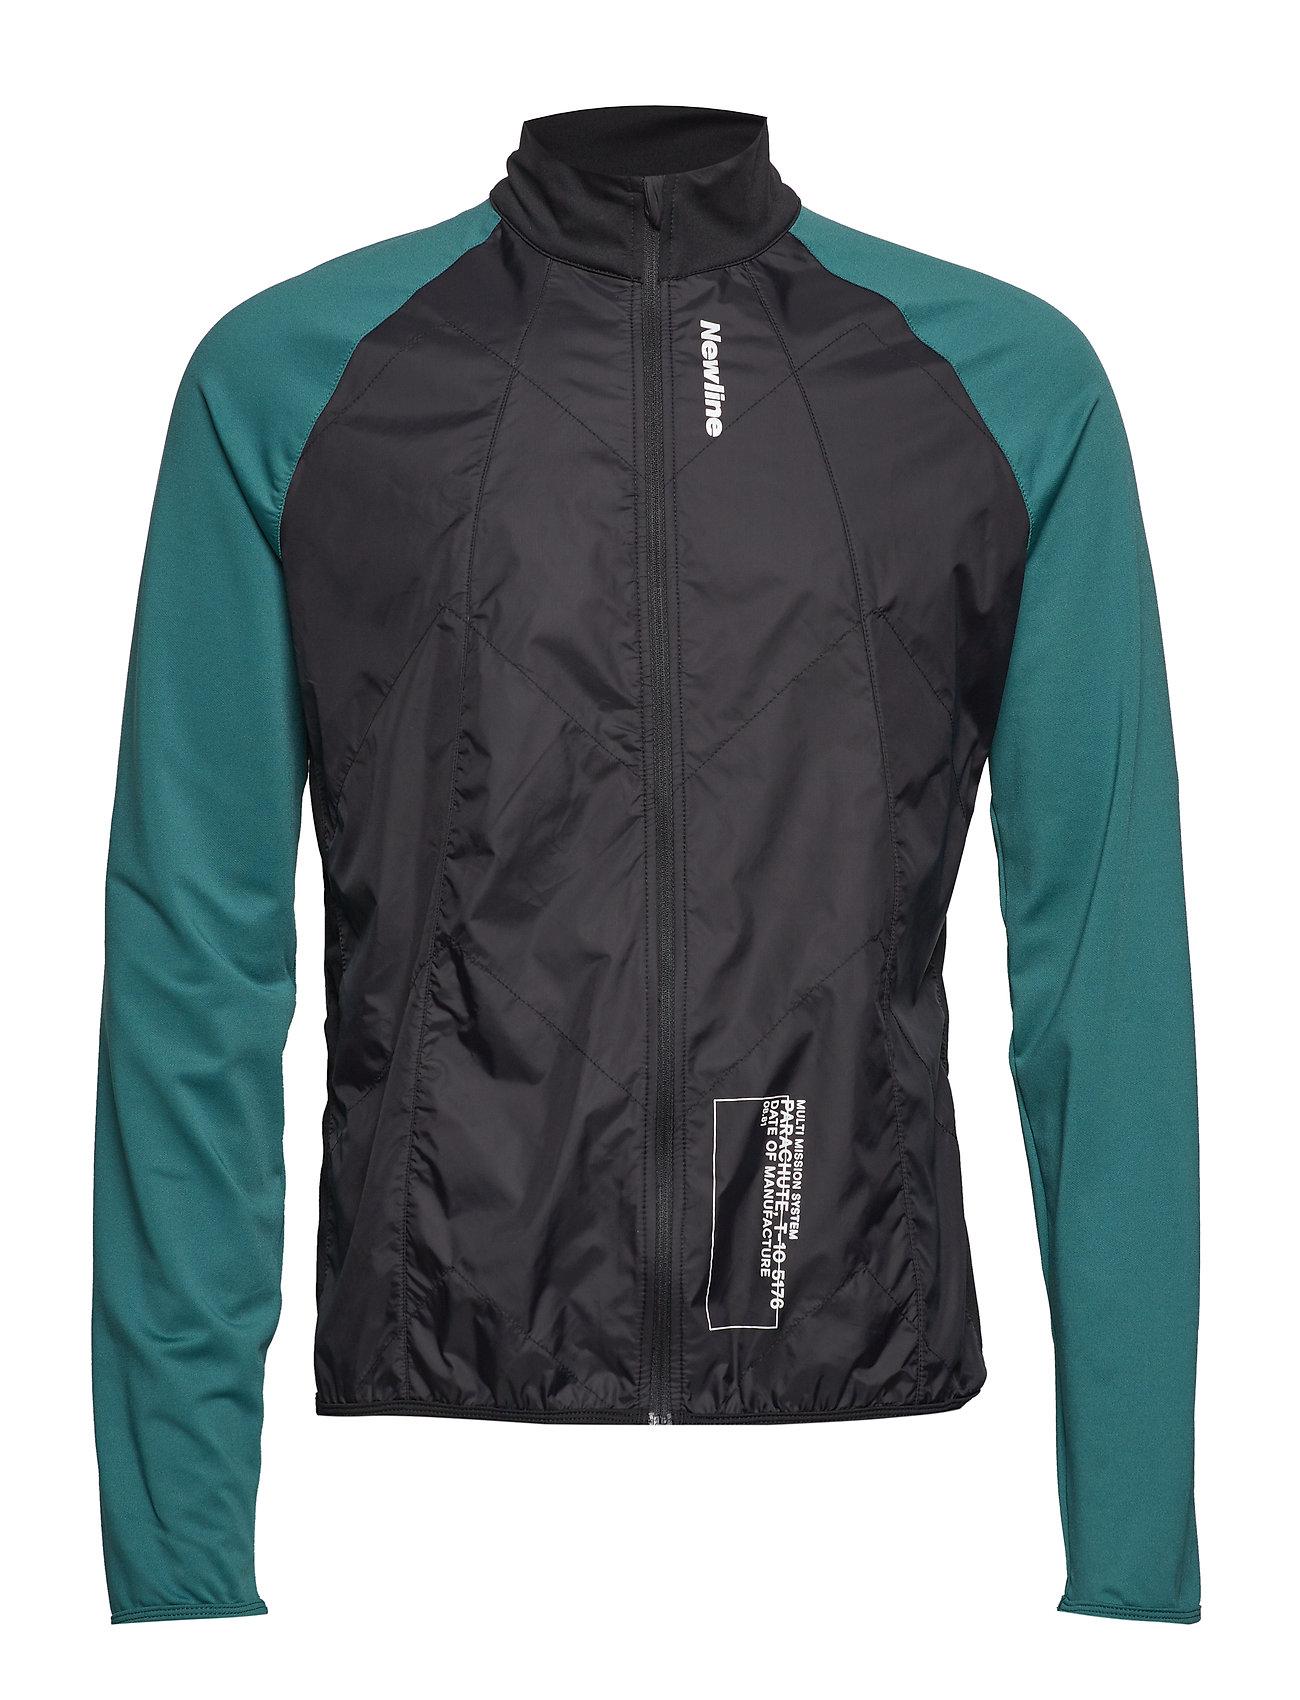 Newline Black Windbreaker Shirt - BLACK